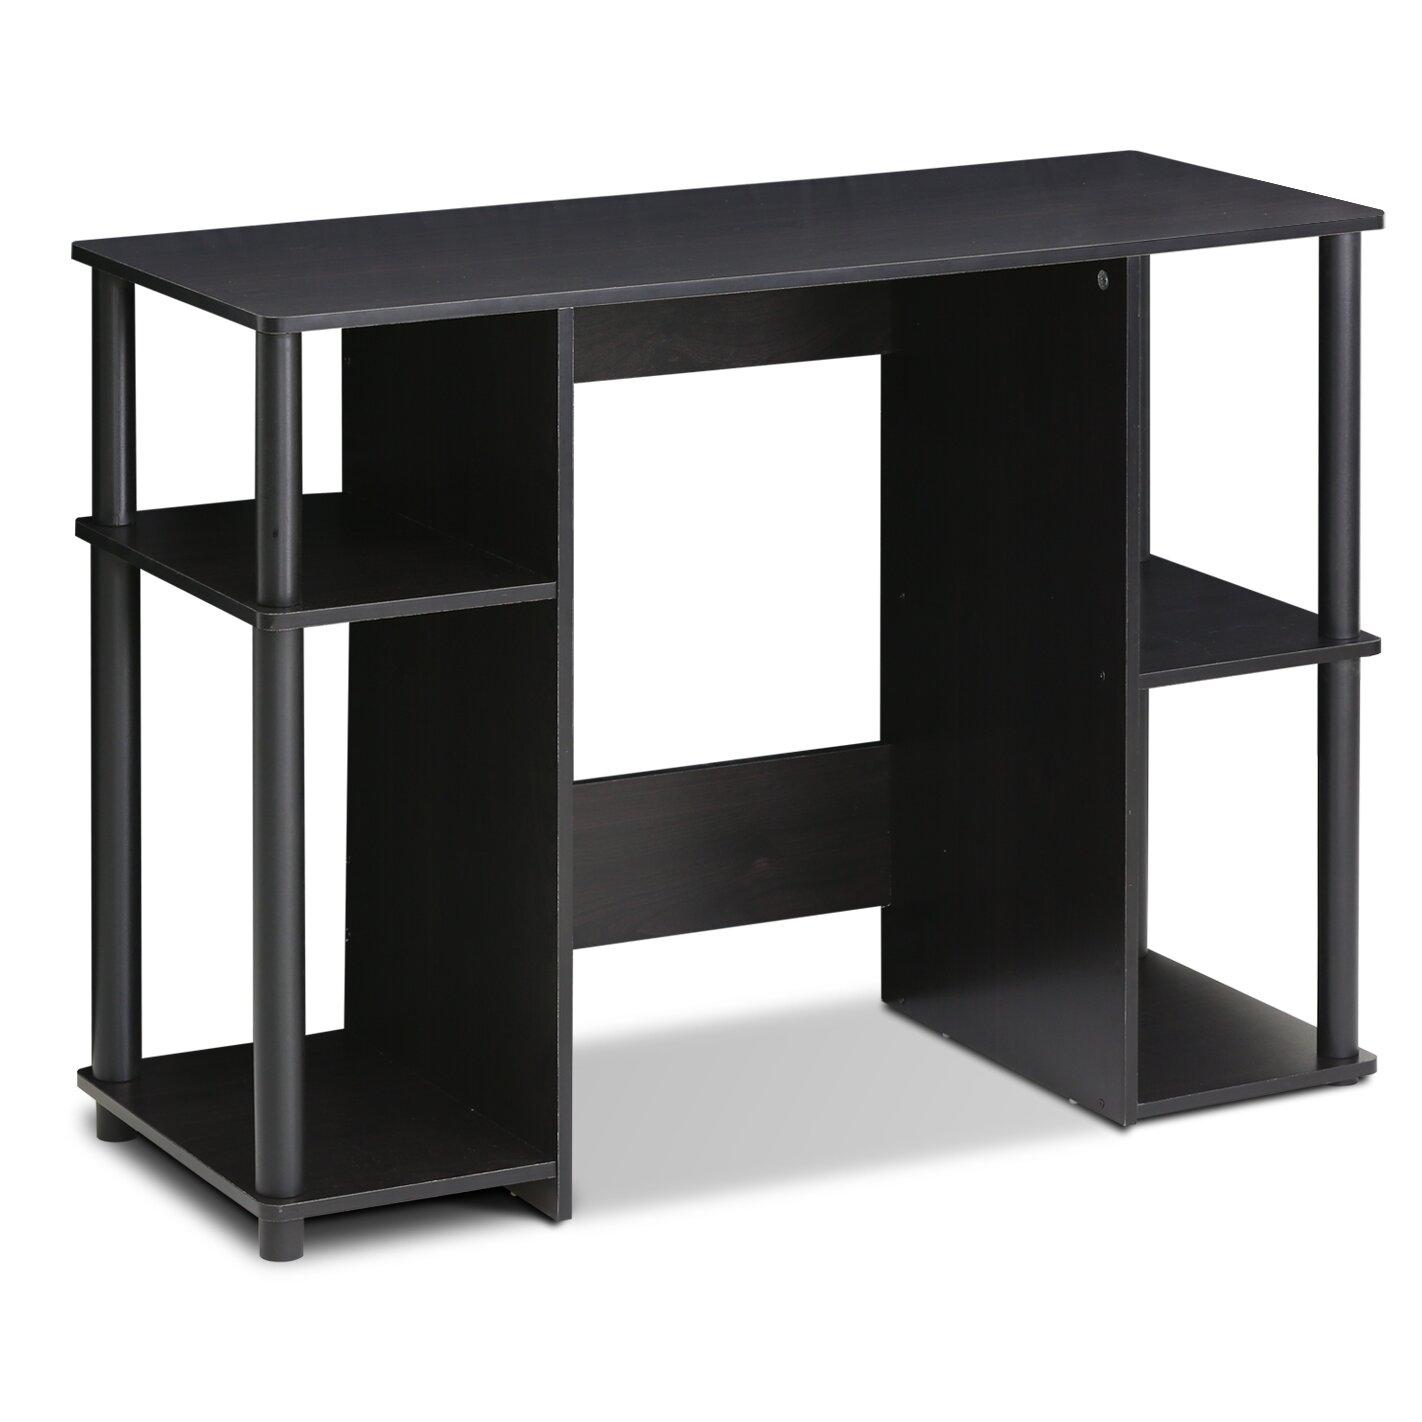 Furinno Computer Desk Furinno 11181 Compact Computer